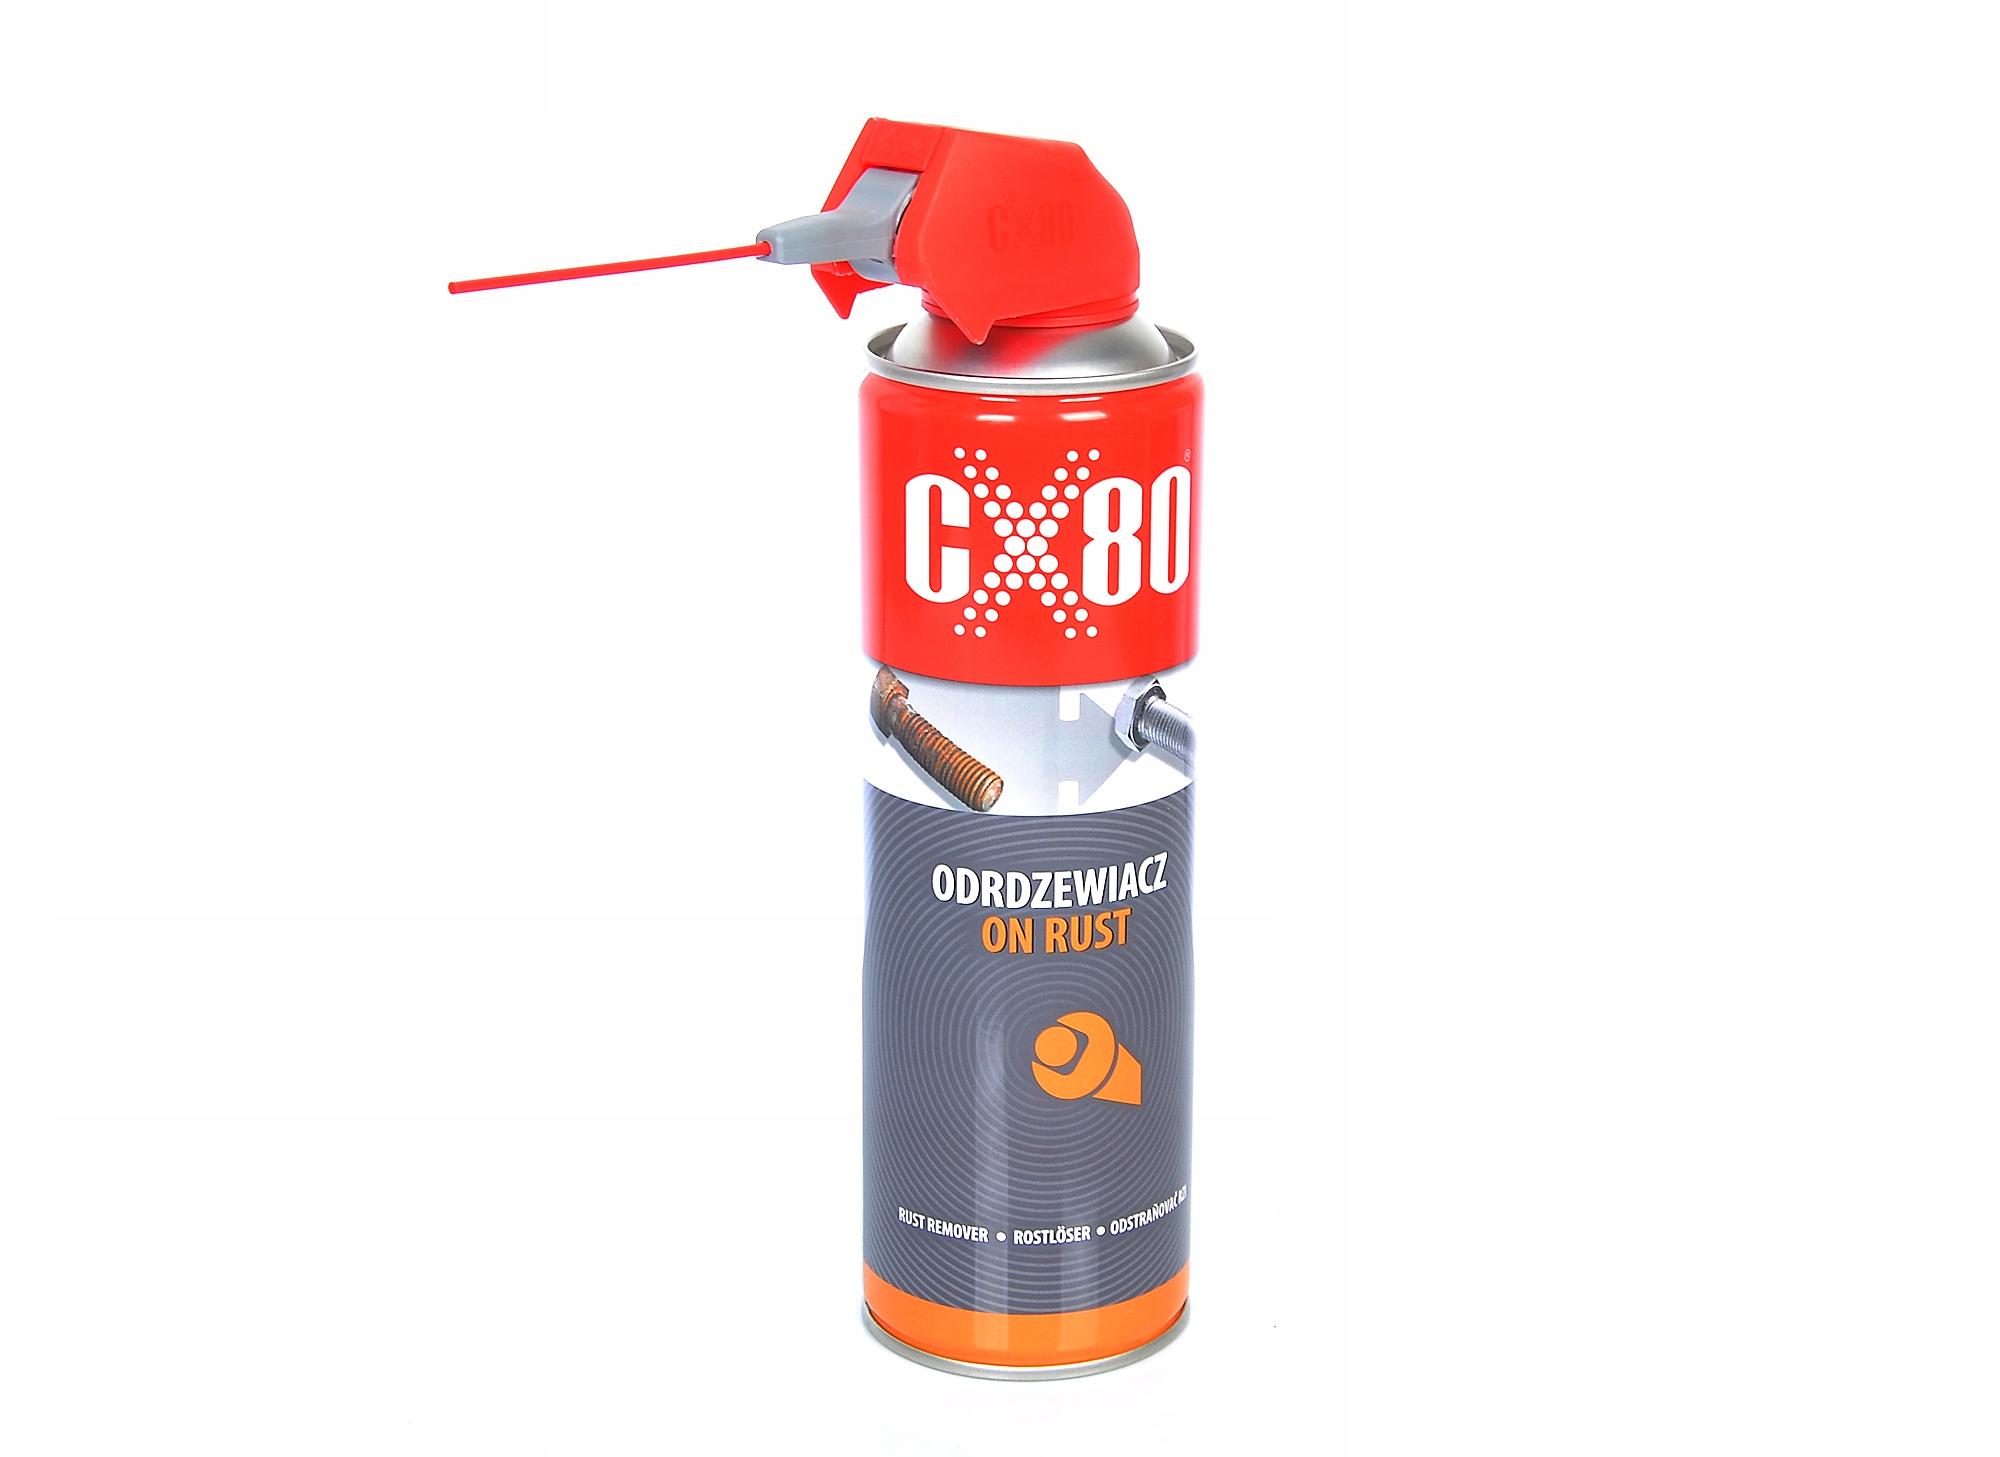 CX-80 ON RUST odrdzewiacz penetrator 500ml